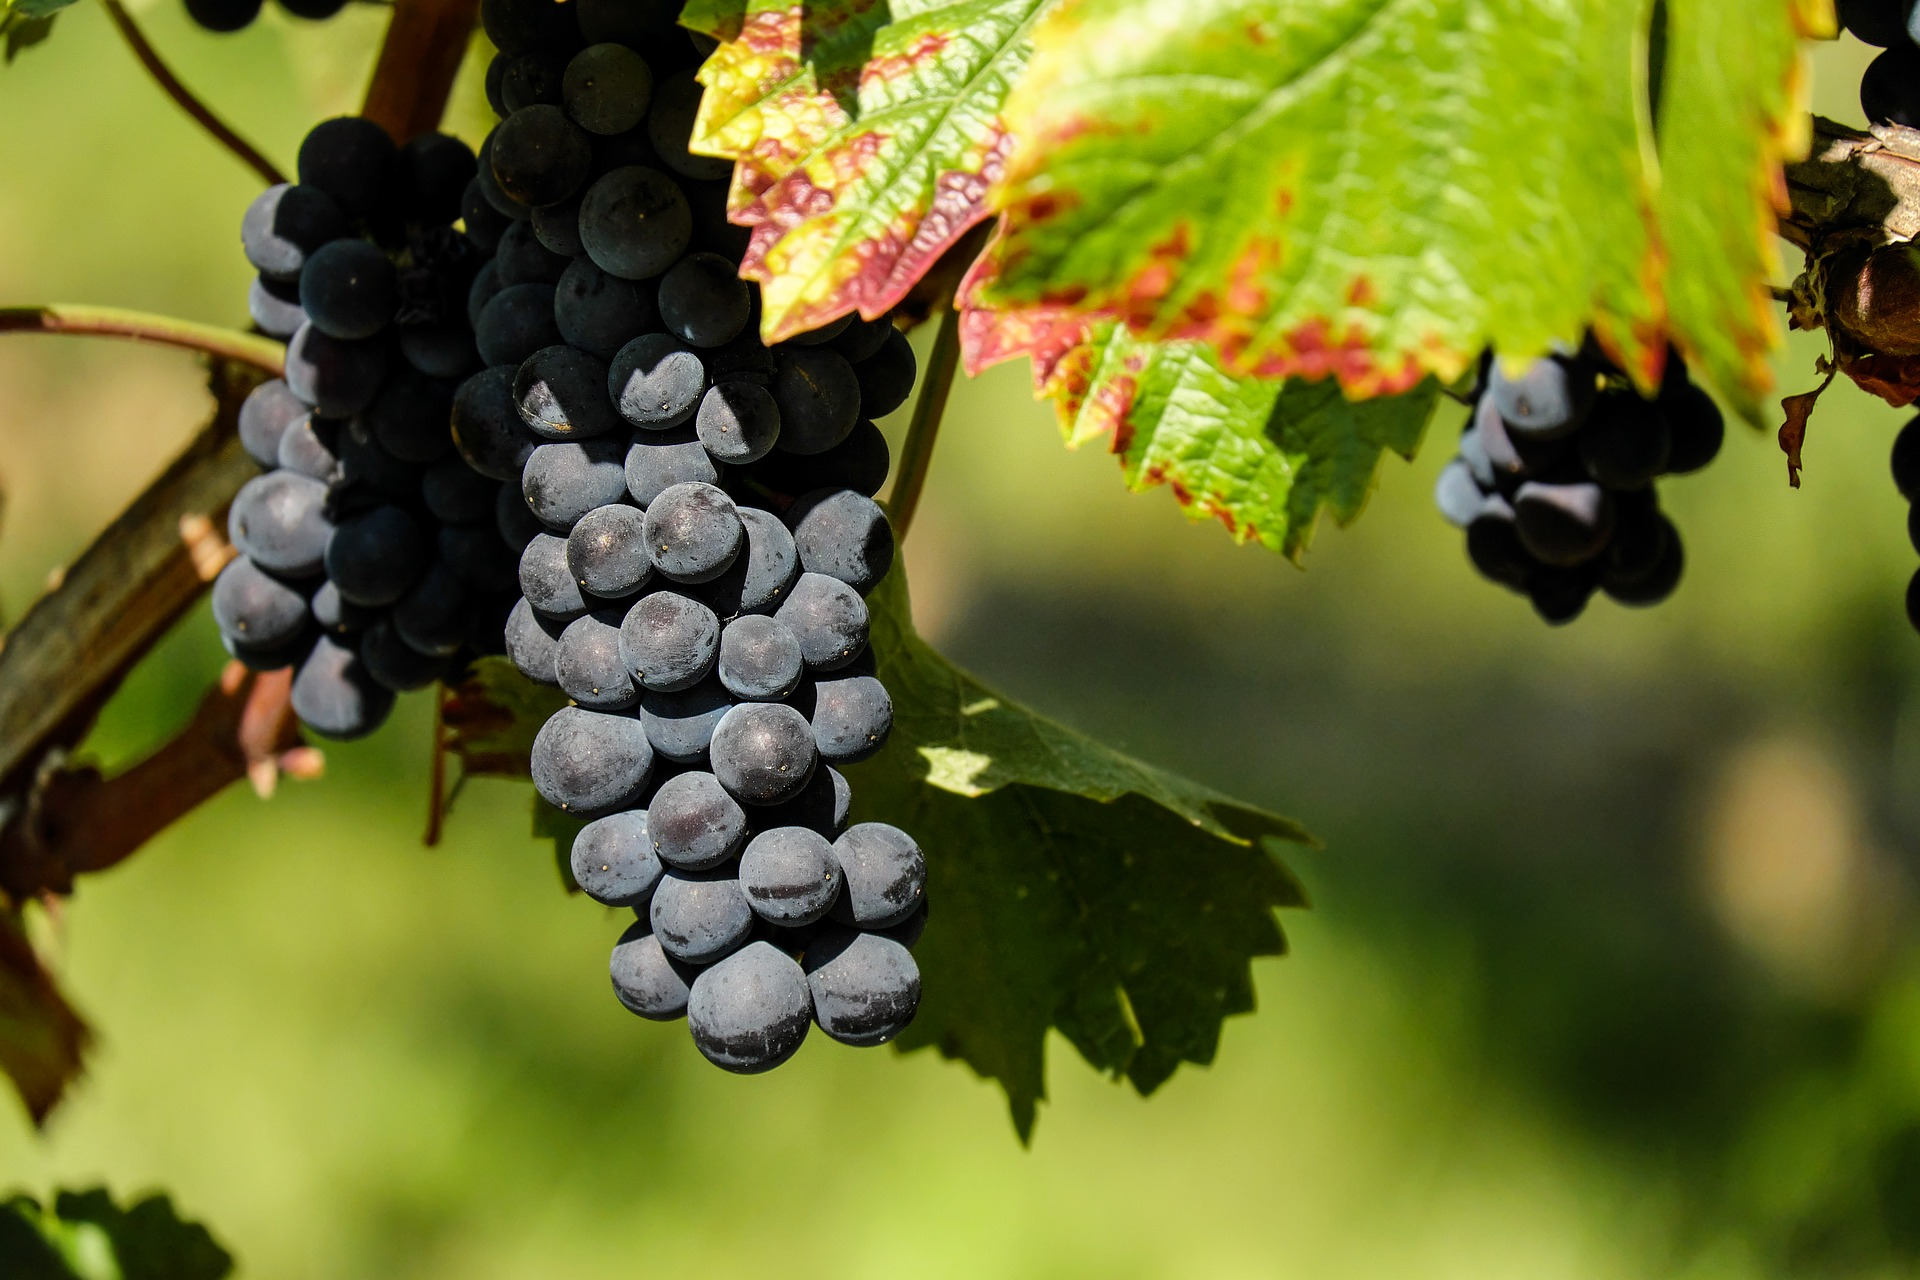 grapes-1696921_1920.jpg